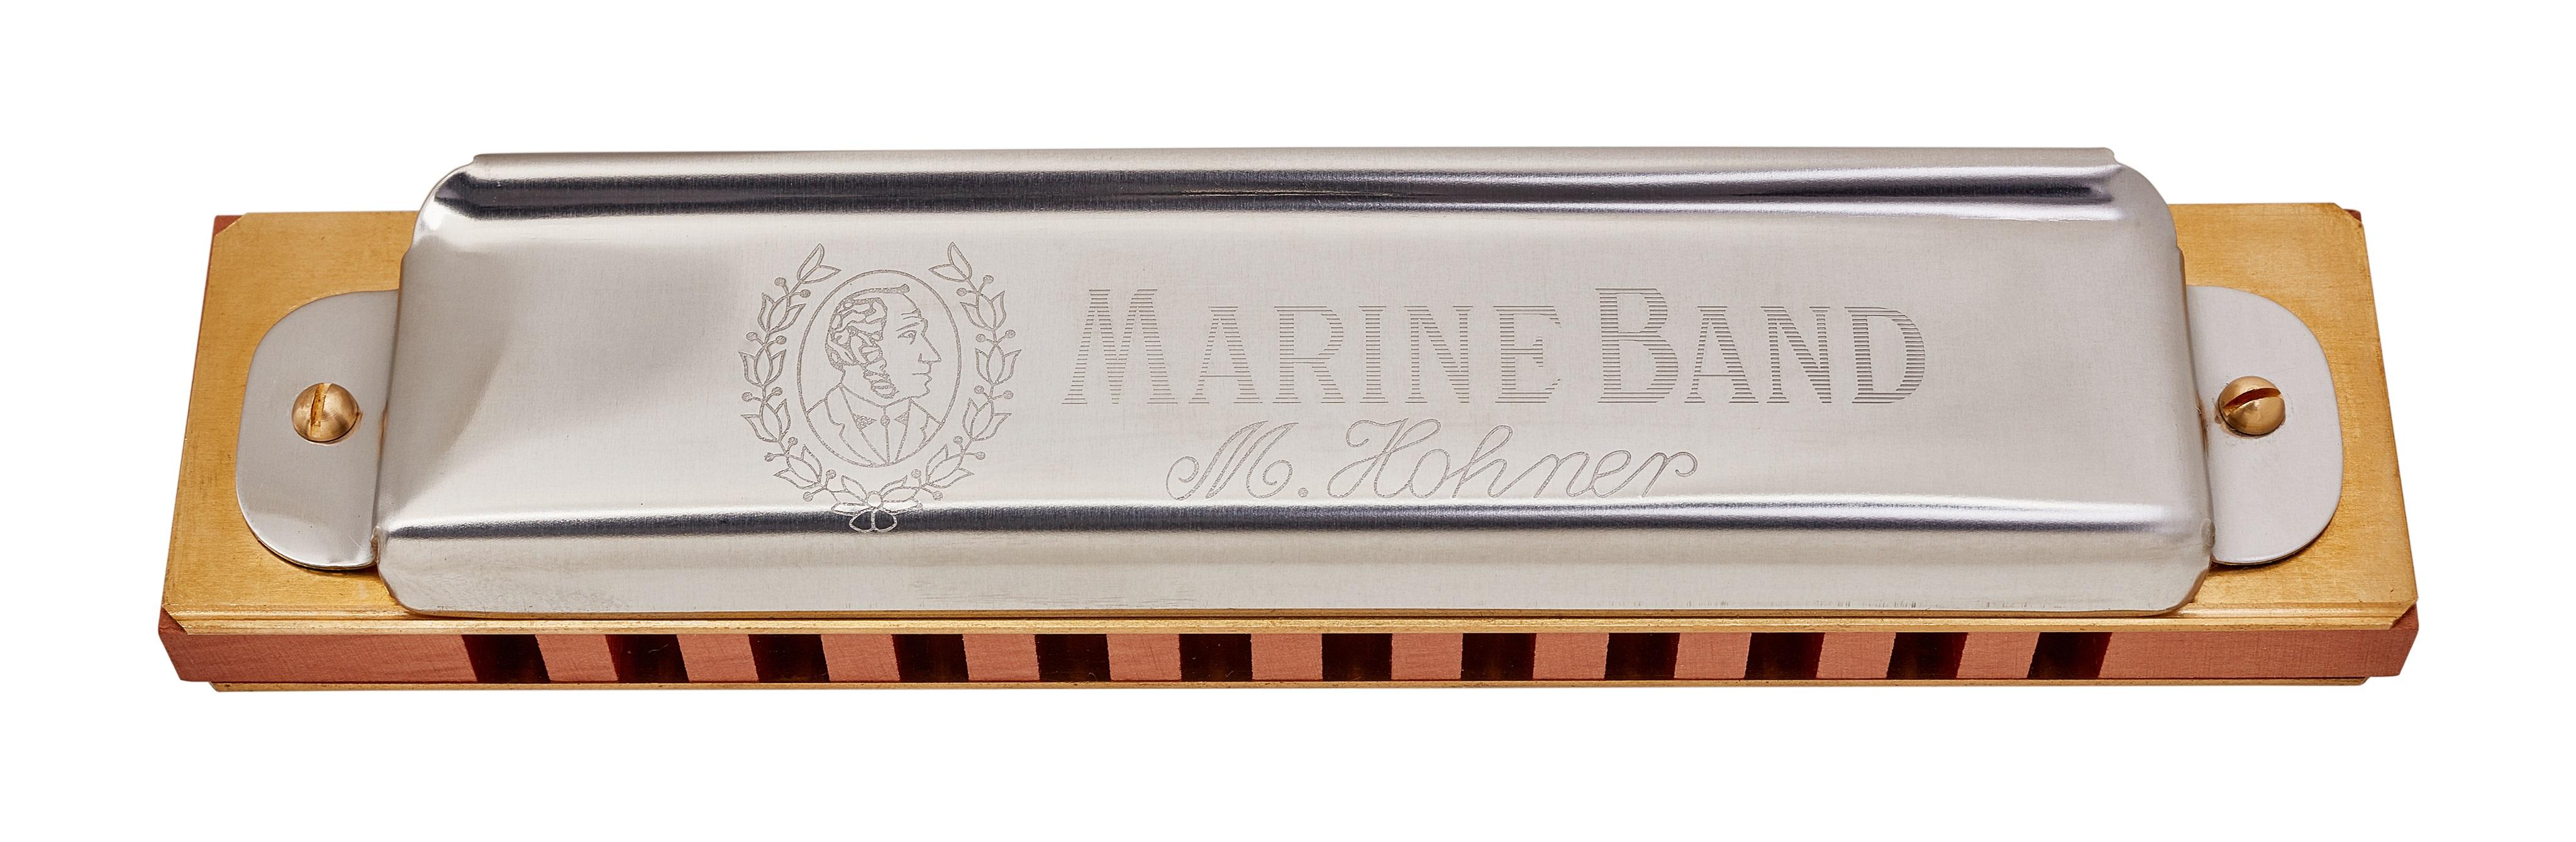 Hohner Marine Band 364/24 Soloist